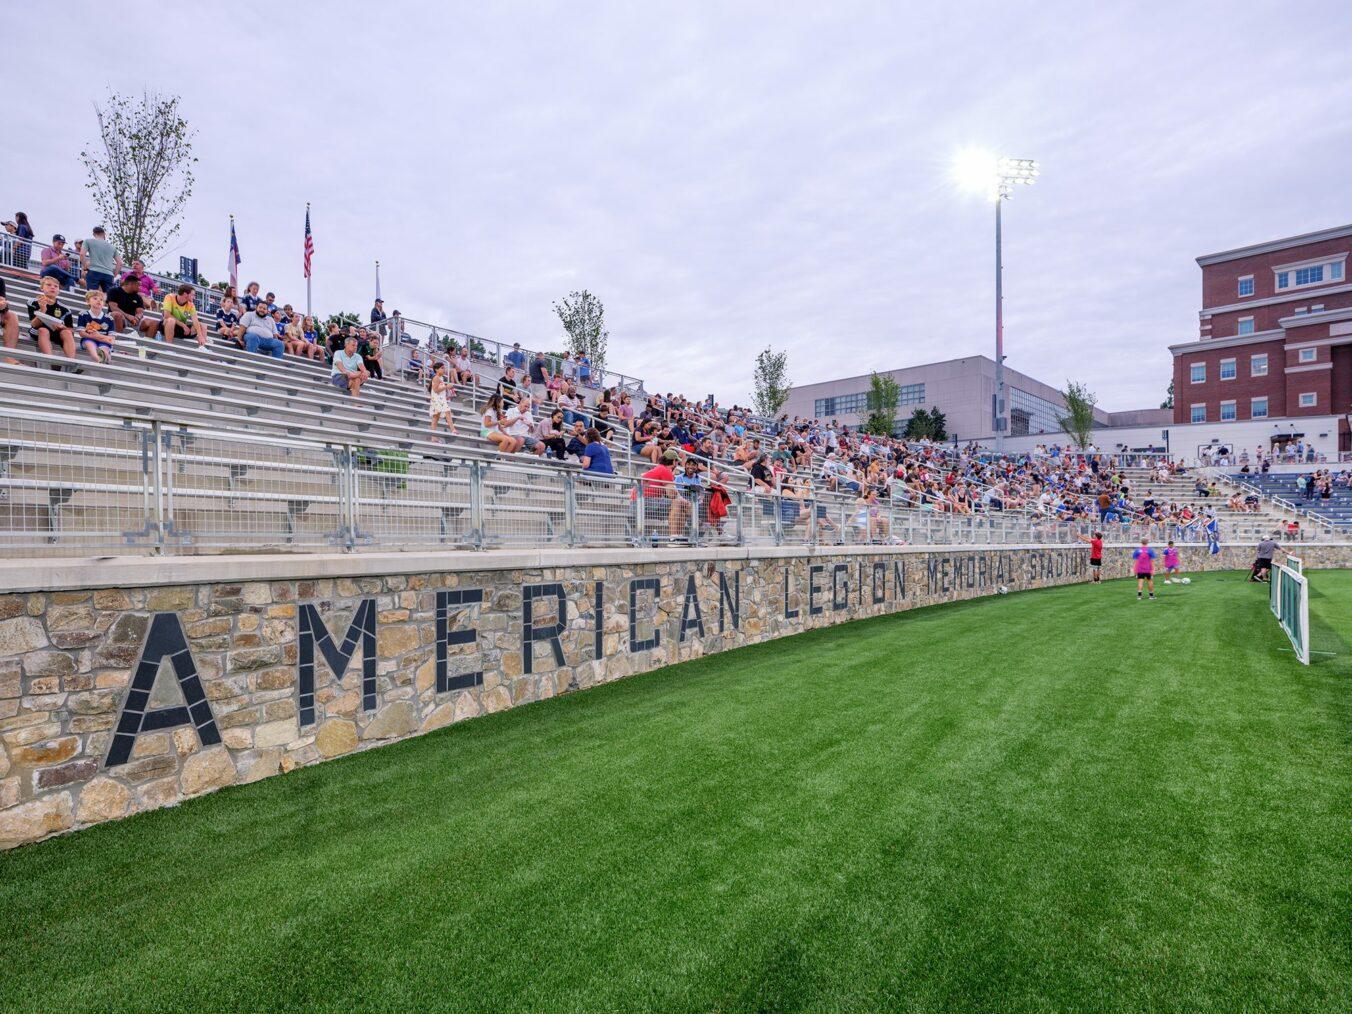 American Legion Memorial Stadium Restored Stone Wall on Opening Night